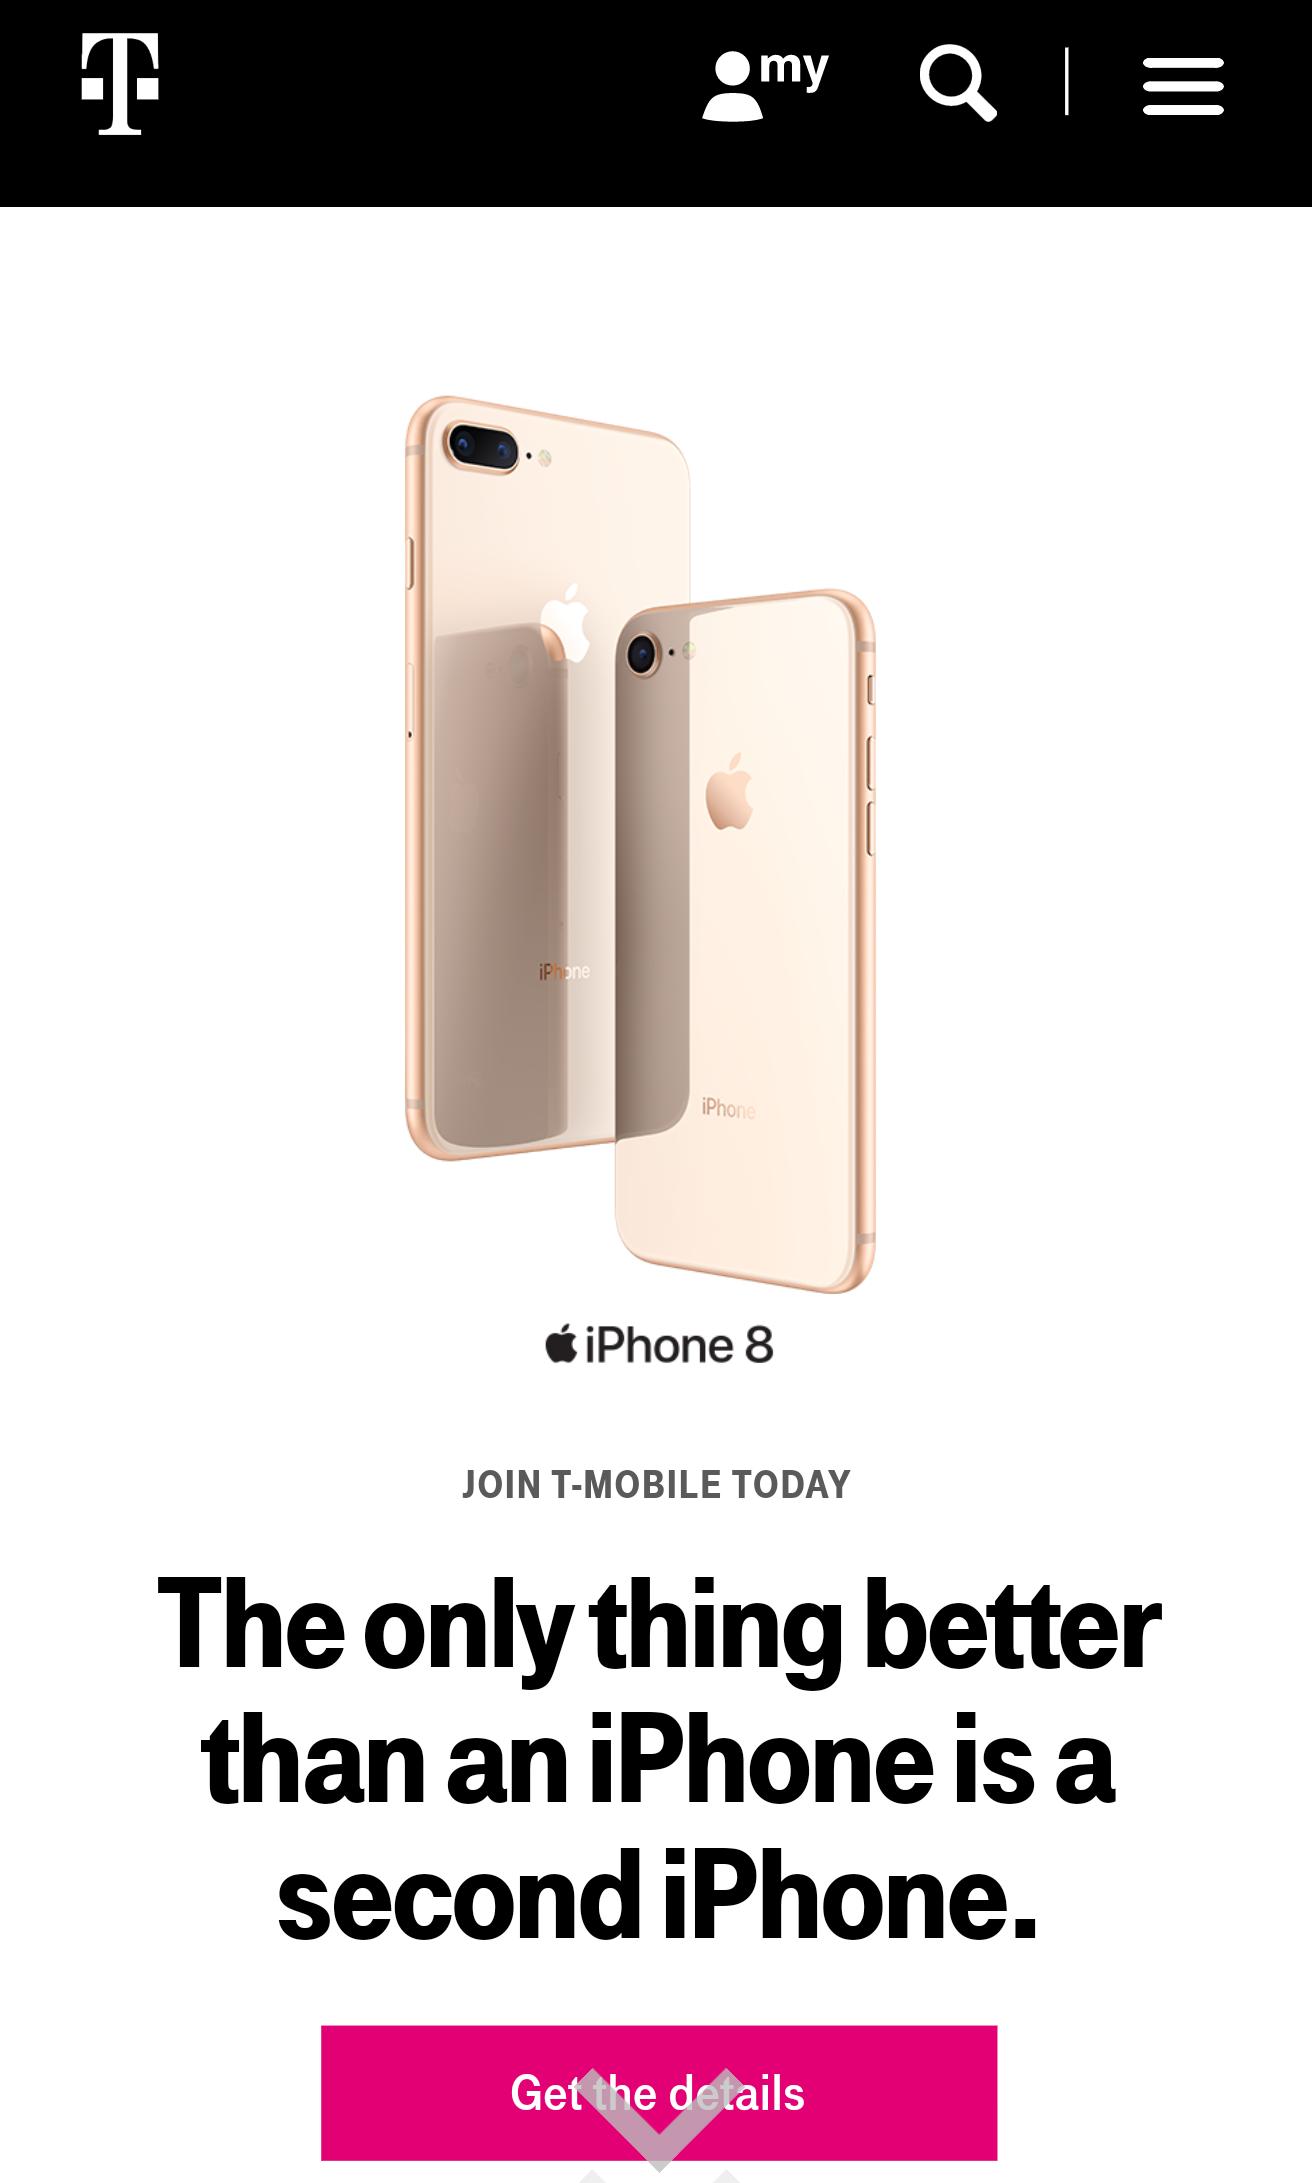 Sweepstake iphone x 256gb tmobile